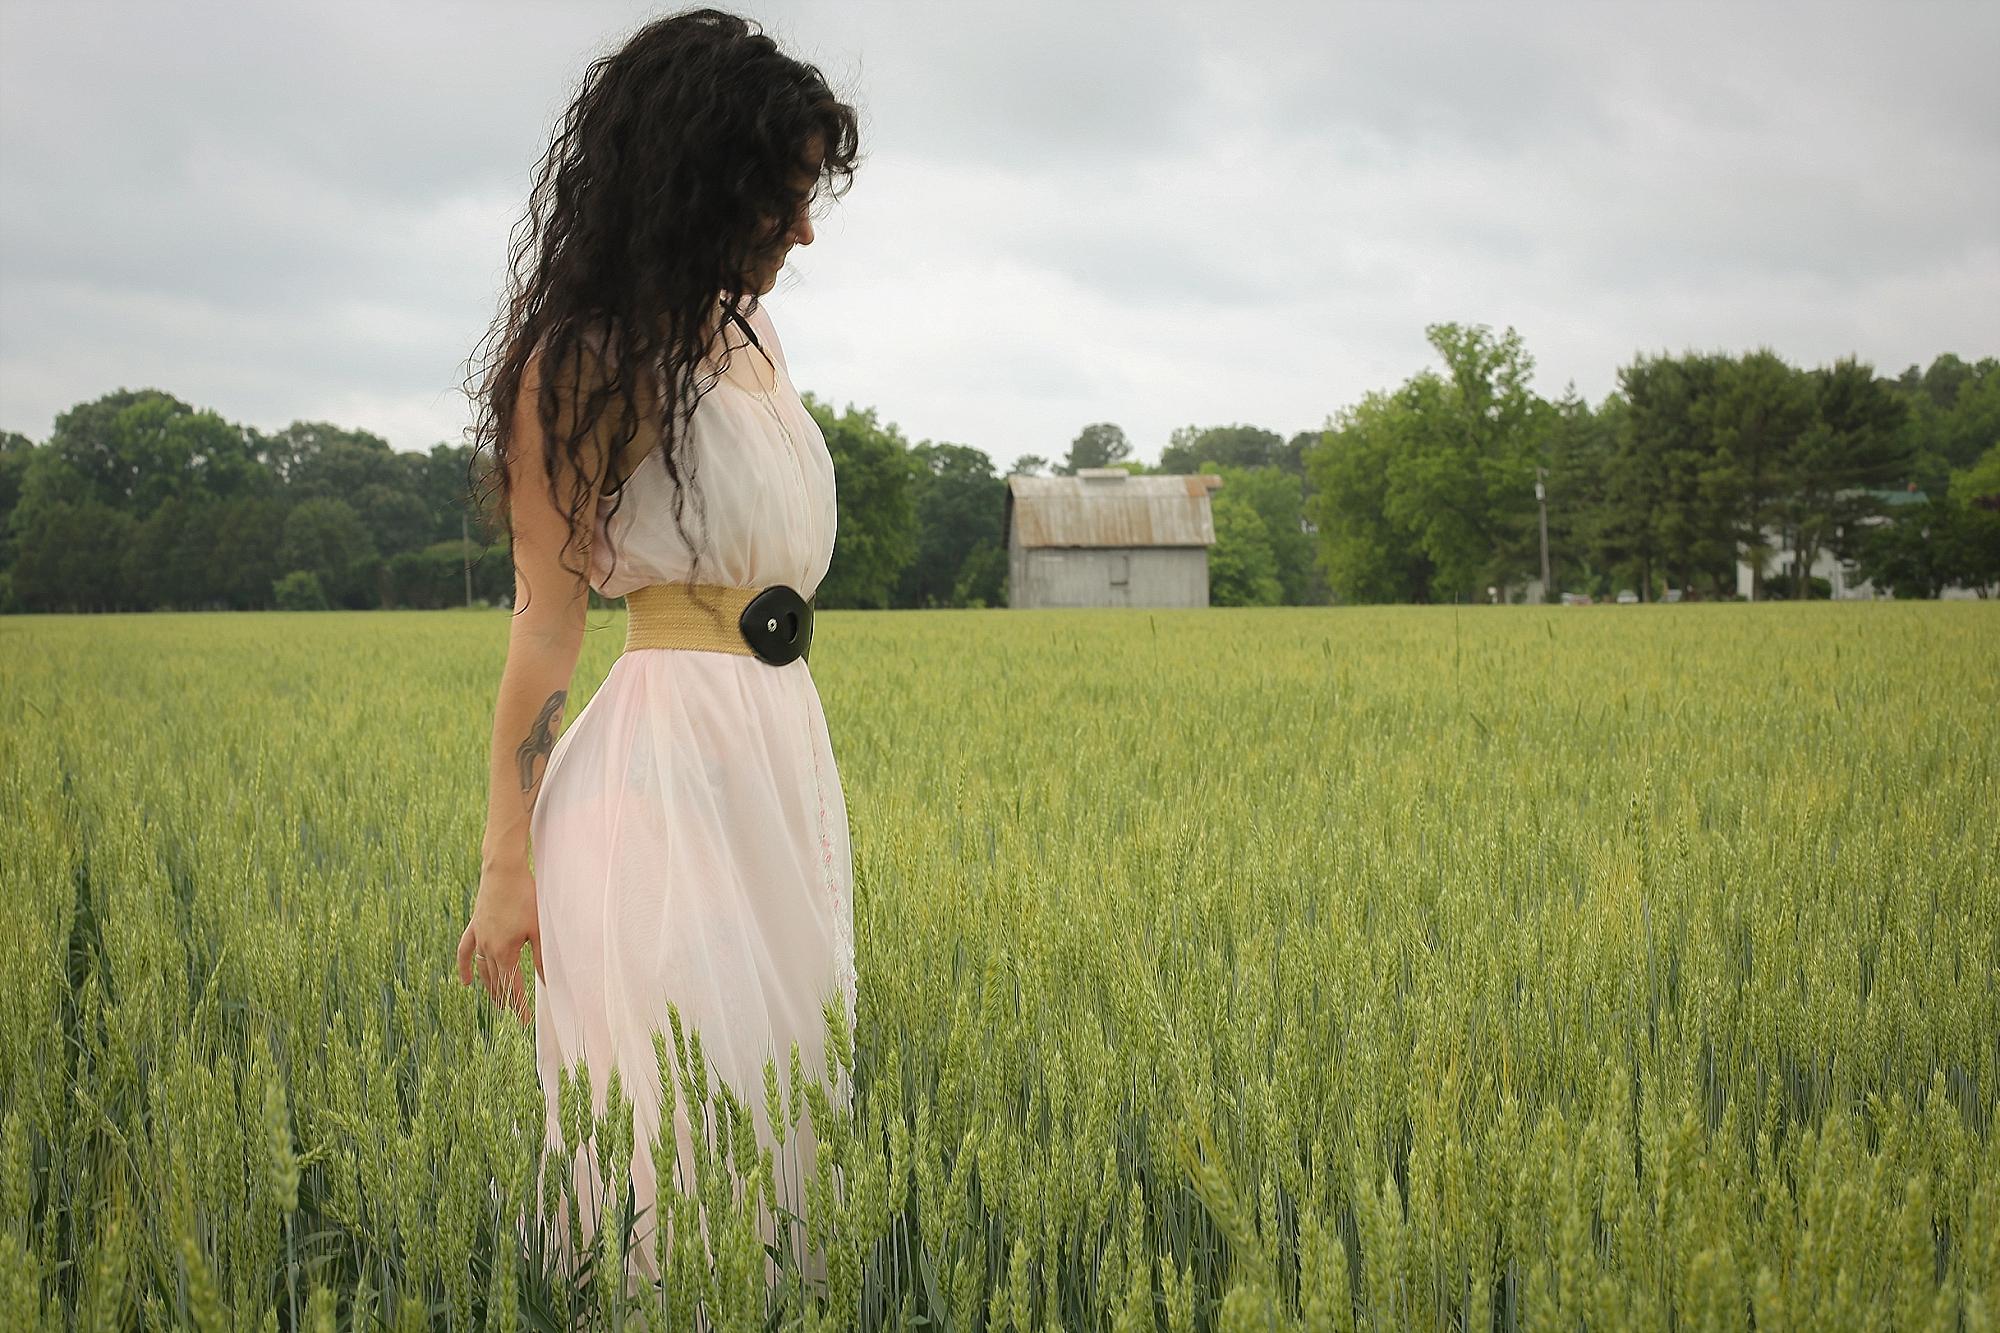 Chesapeak-Reedville-Virginia-Creative-Portrait-Photography_0004.jpg